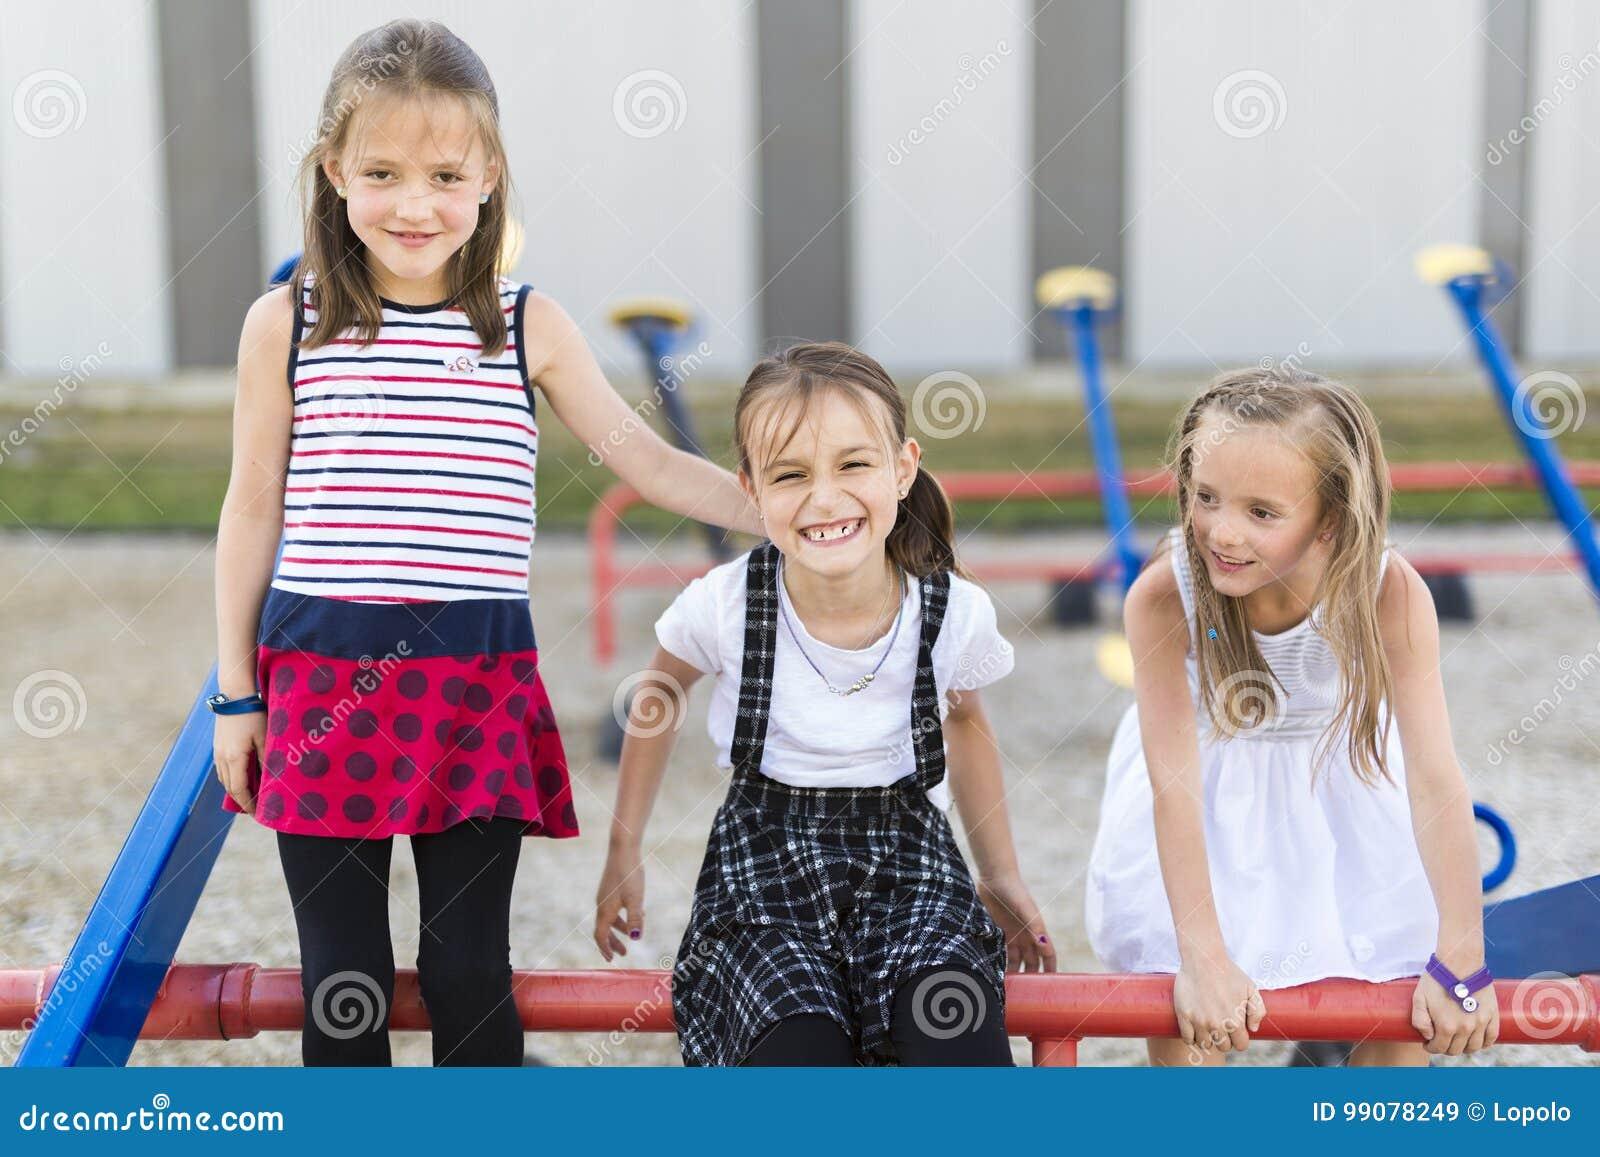 Cheerful School Age Child Play On Playground School Stock ...